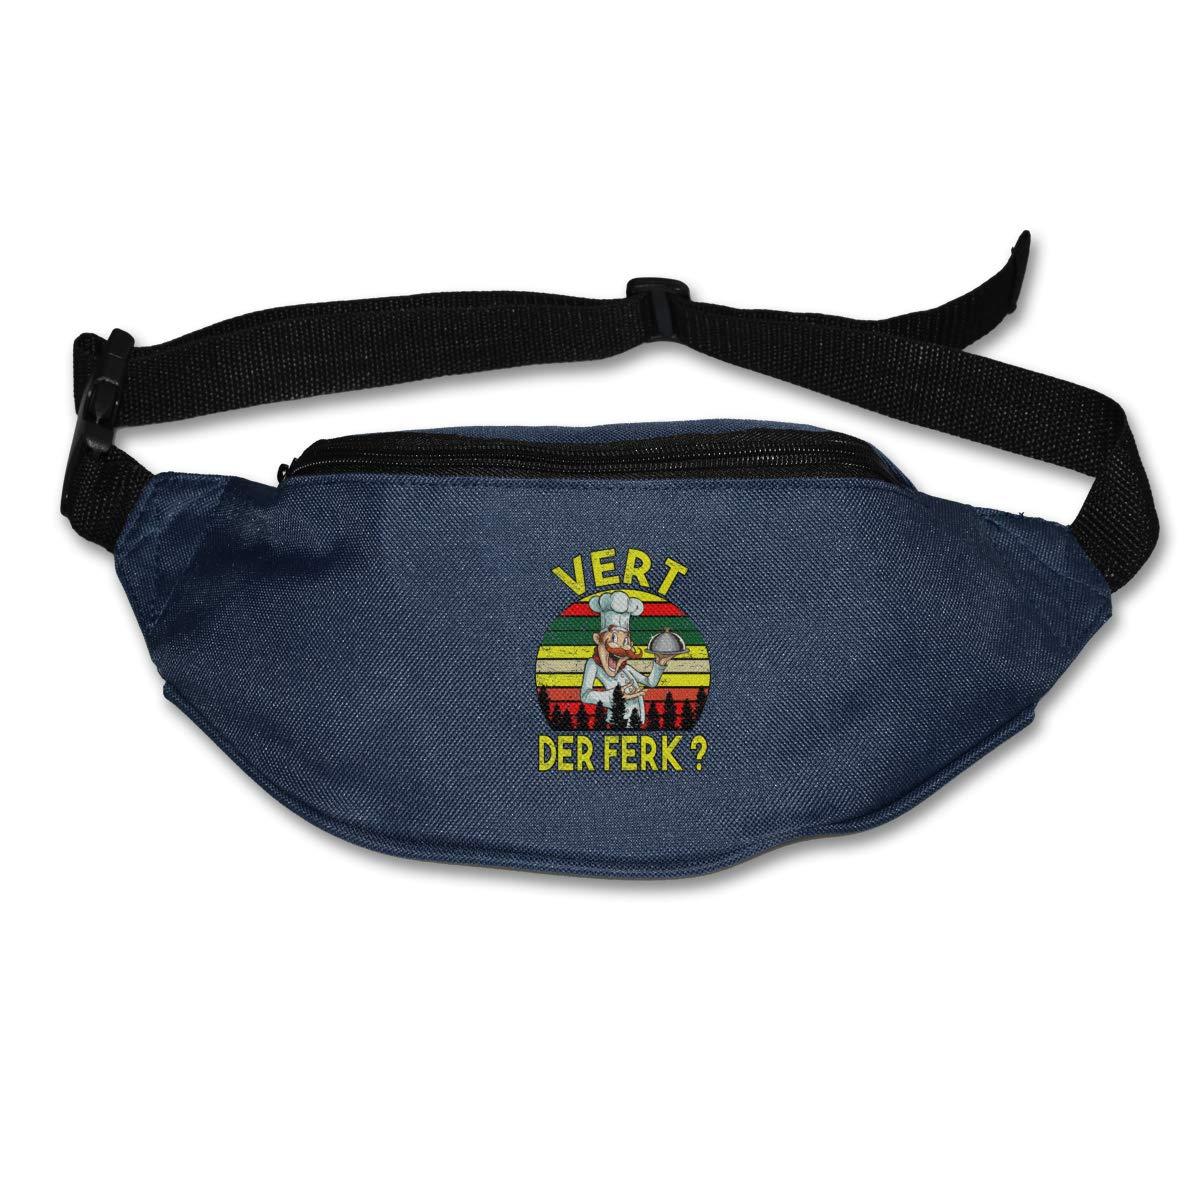 Vert Der Ferk Sport Waist Packs Fanny Pack Adjustable For Run